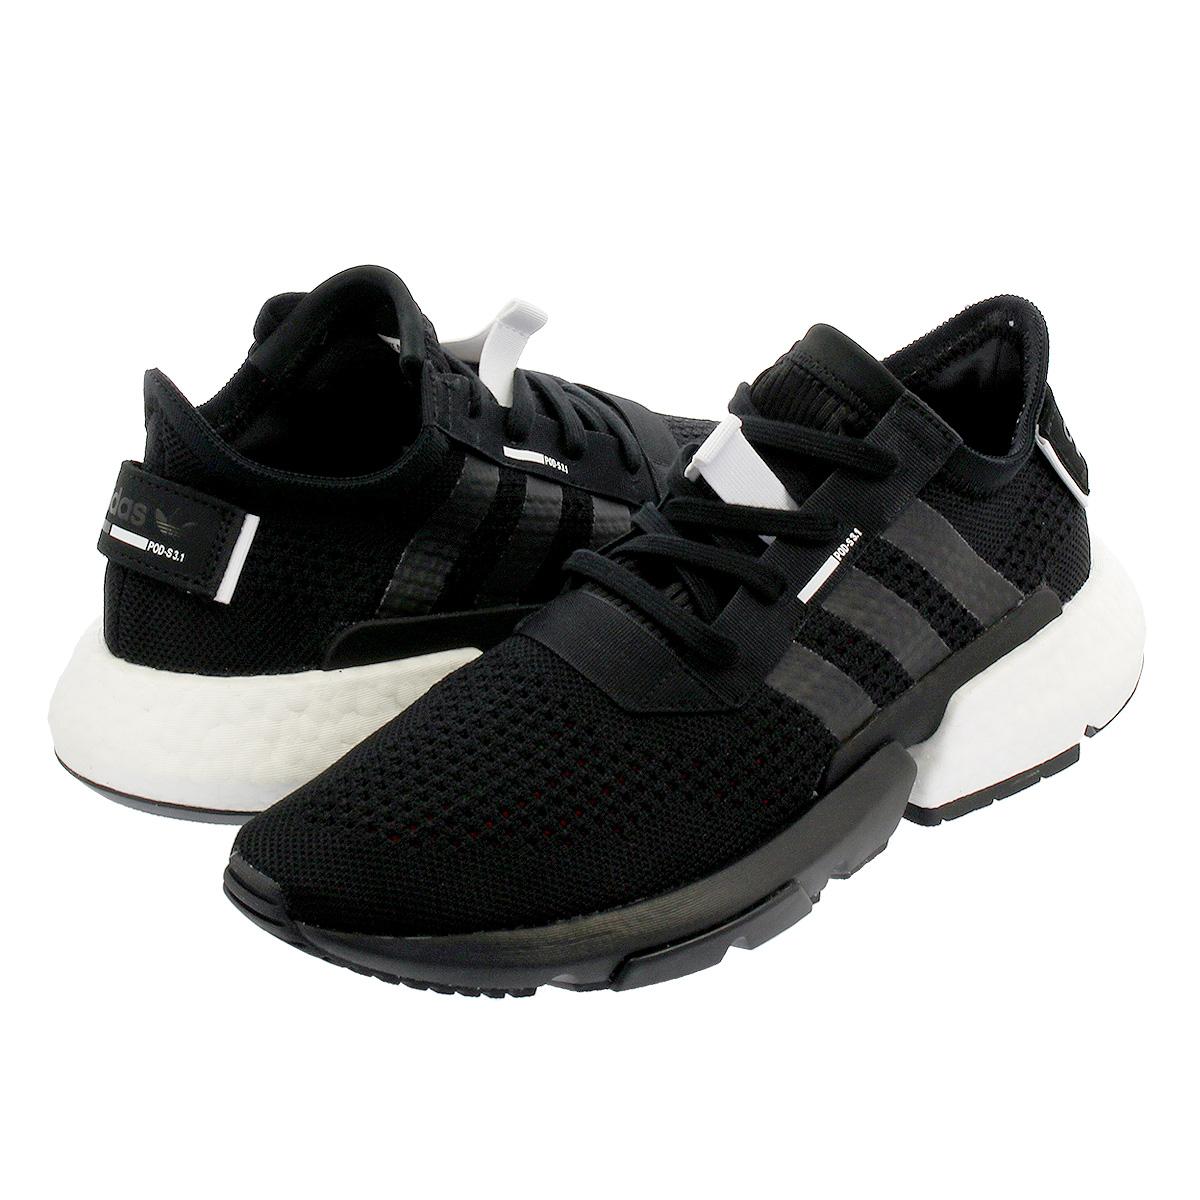 adidas POD S3.1 Adidas POD S3.1 CORE BLACKCORE BLACKRUNNING WHITE db3378